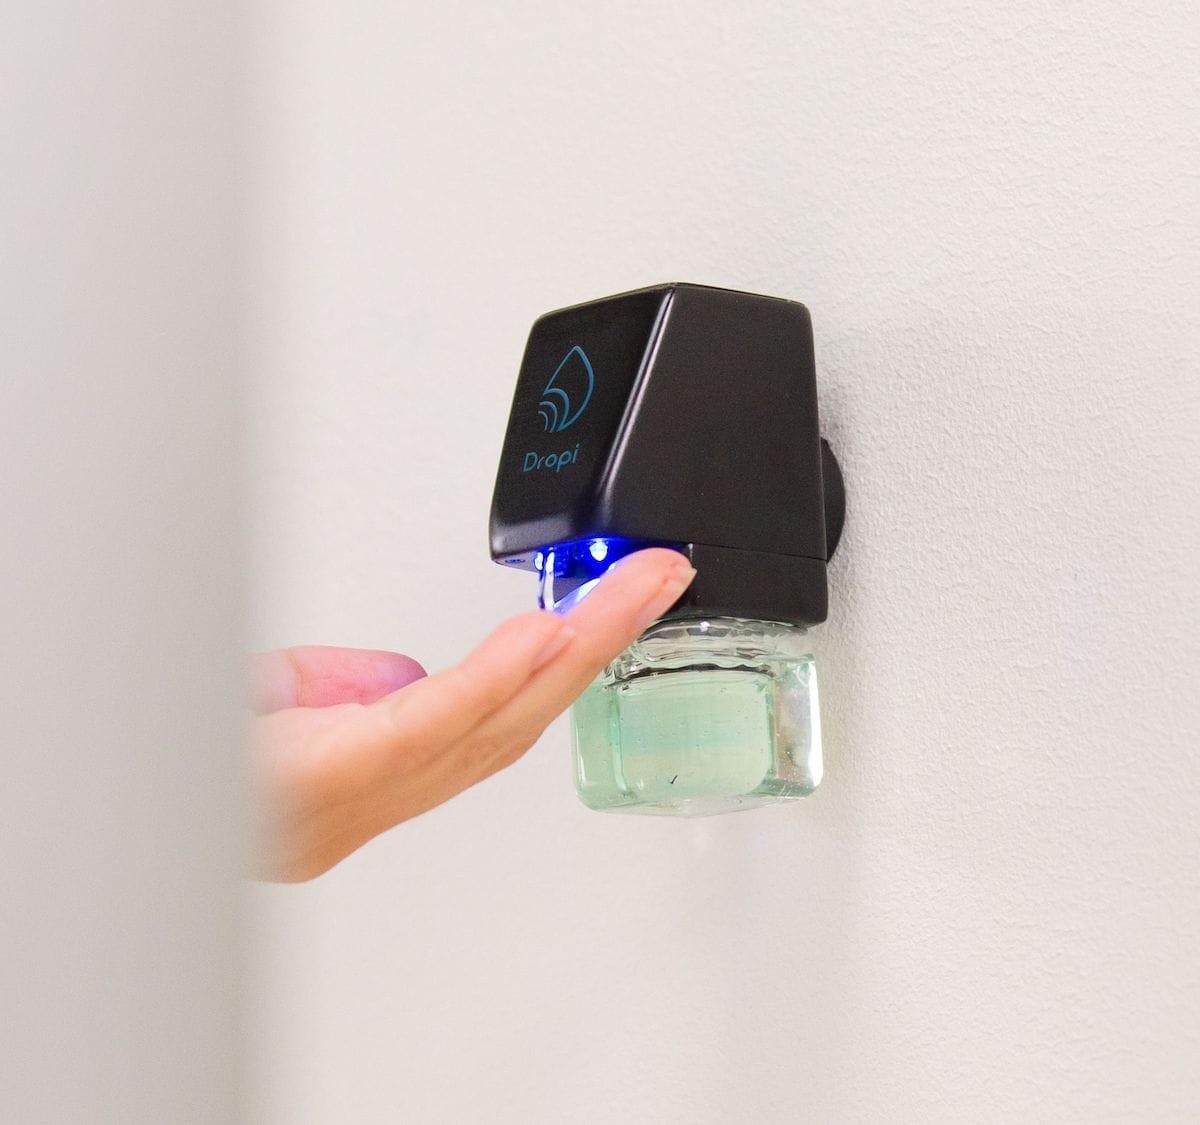 Dropi touchless hand sanitizer dispenser mounts anywhere and senses motion